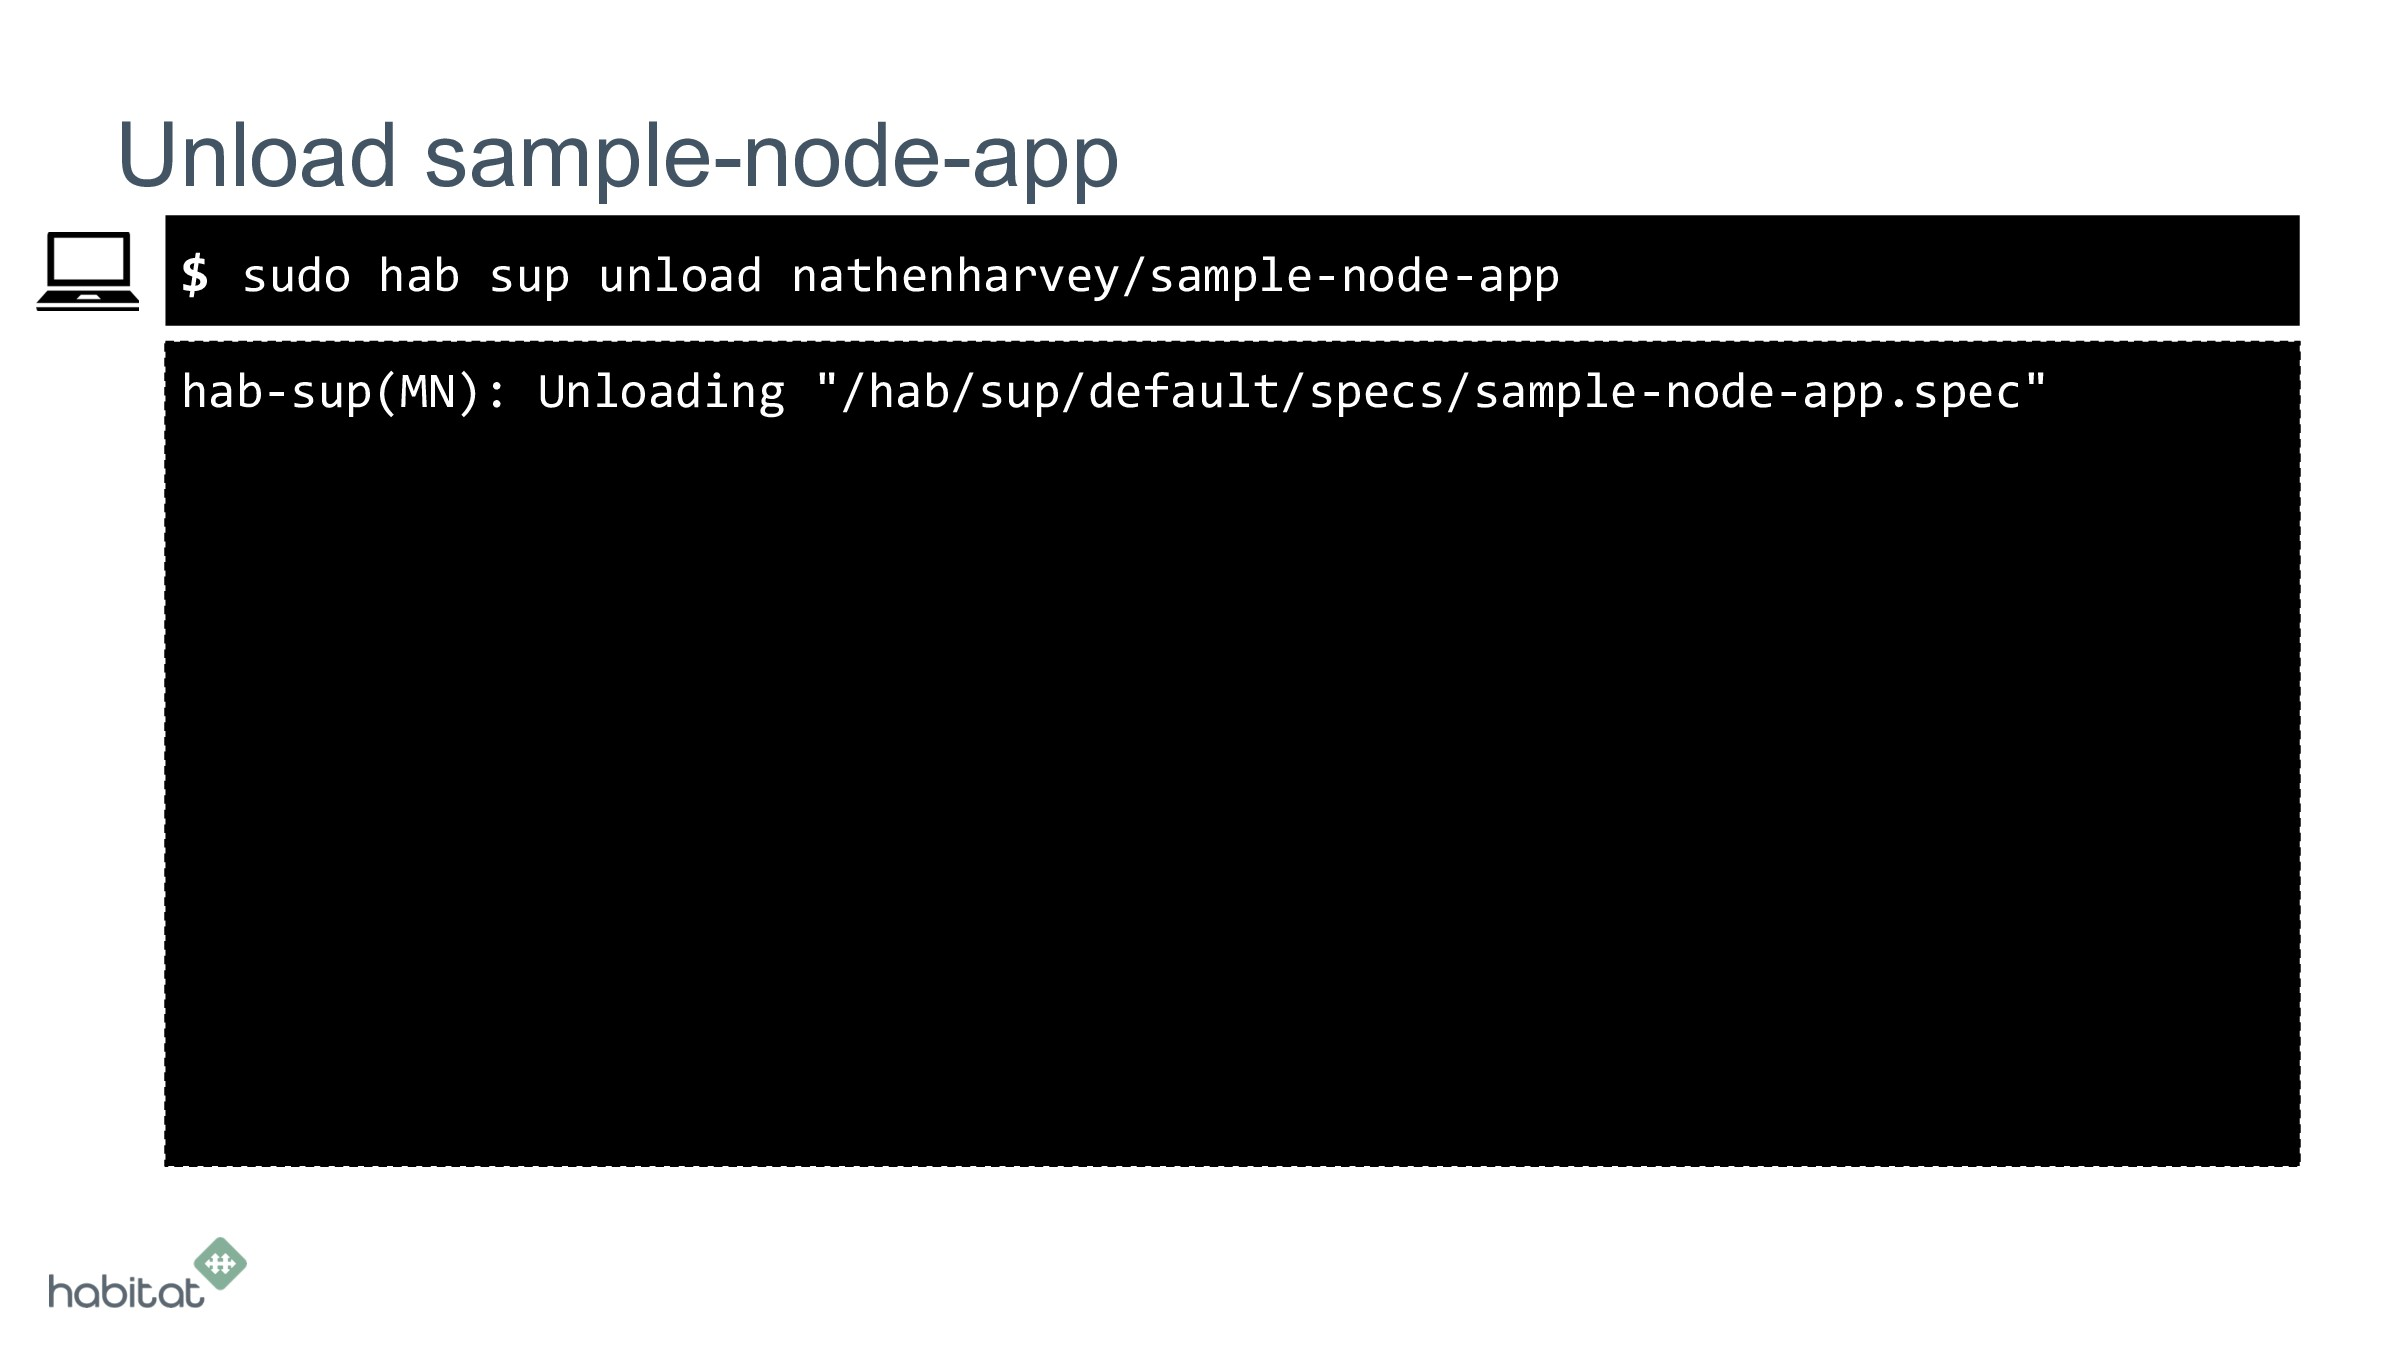 "$ hab-sup(MN): Unloading ""/hab/sup/default/spec..."